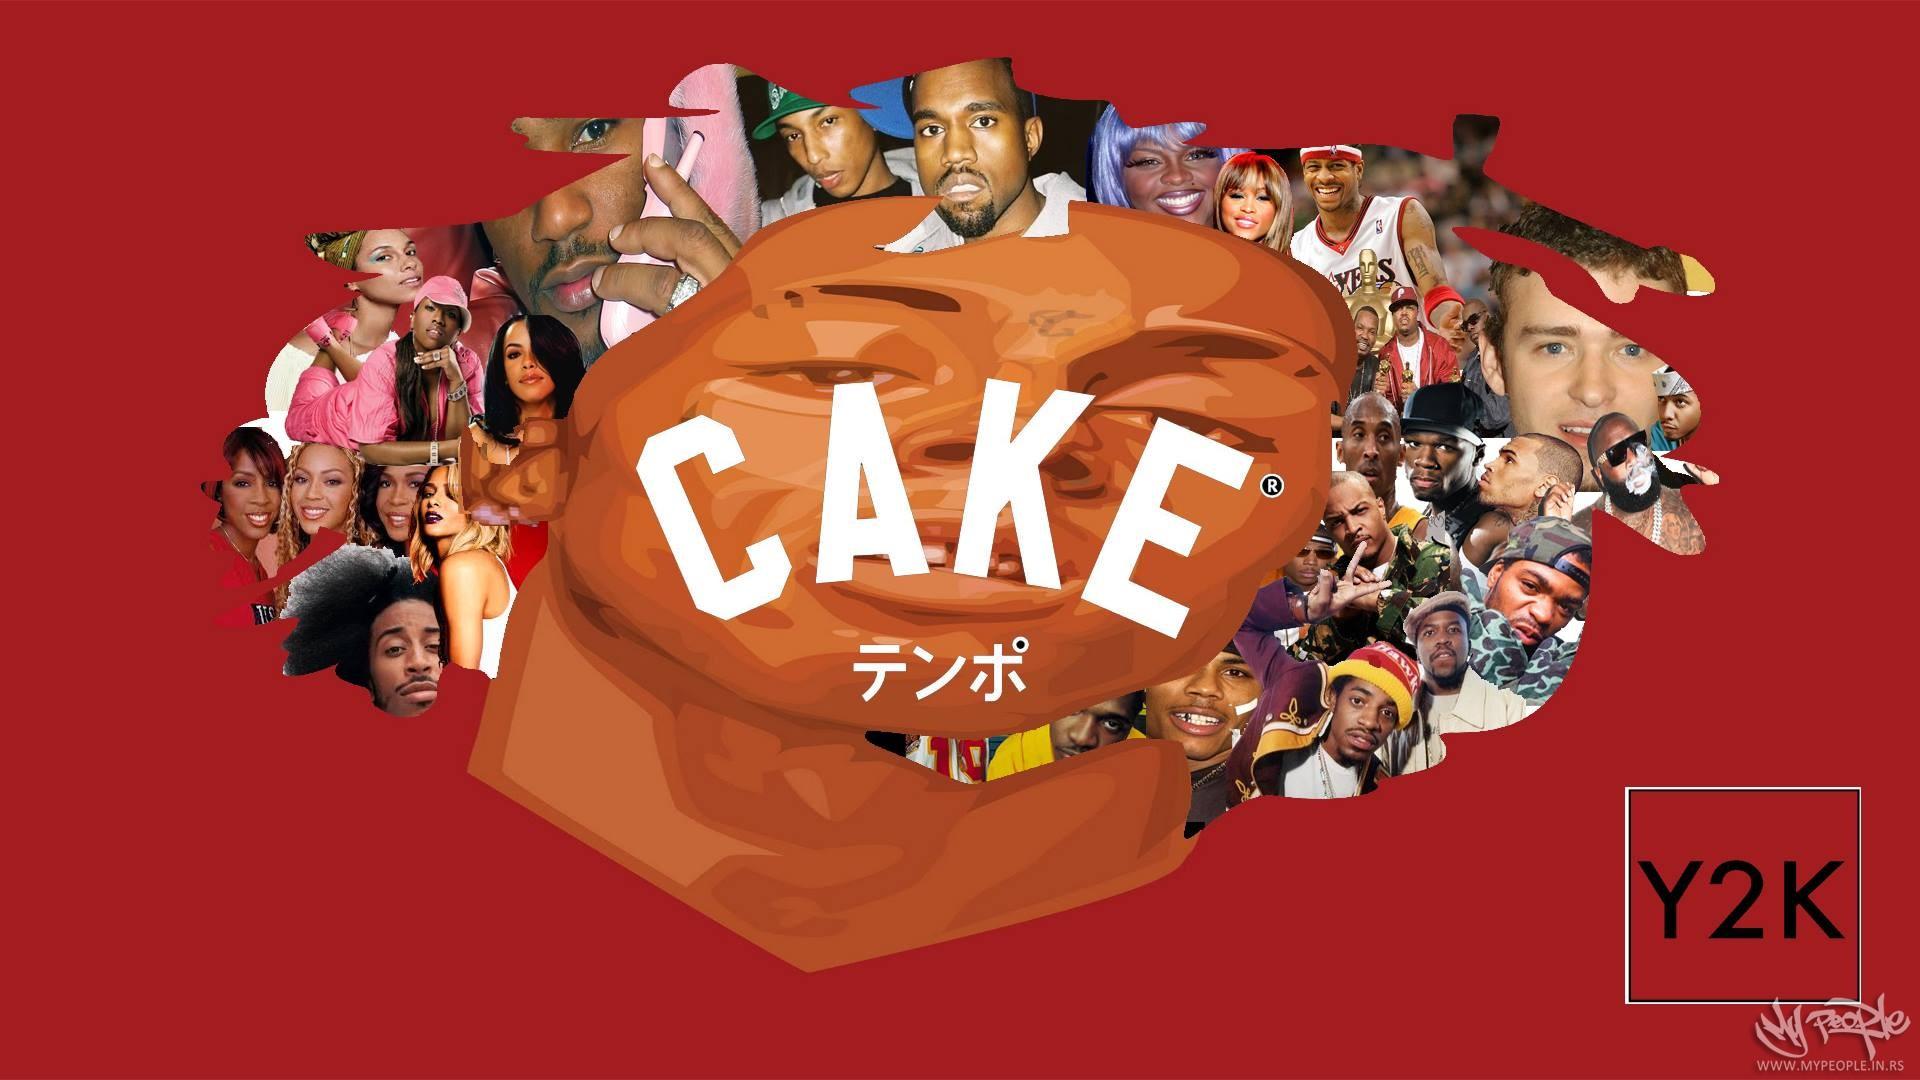 CAKE Beats | Y2K Special @ The Quarter